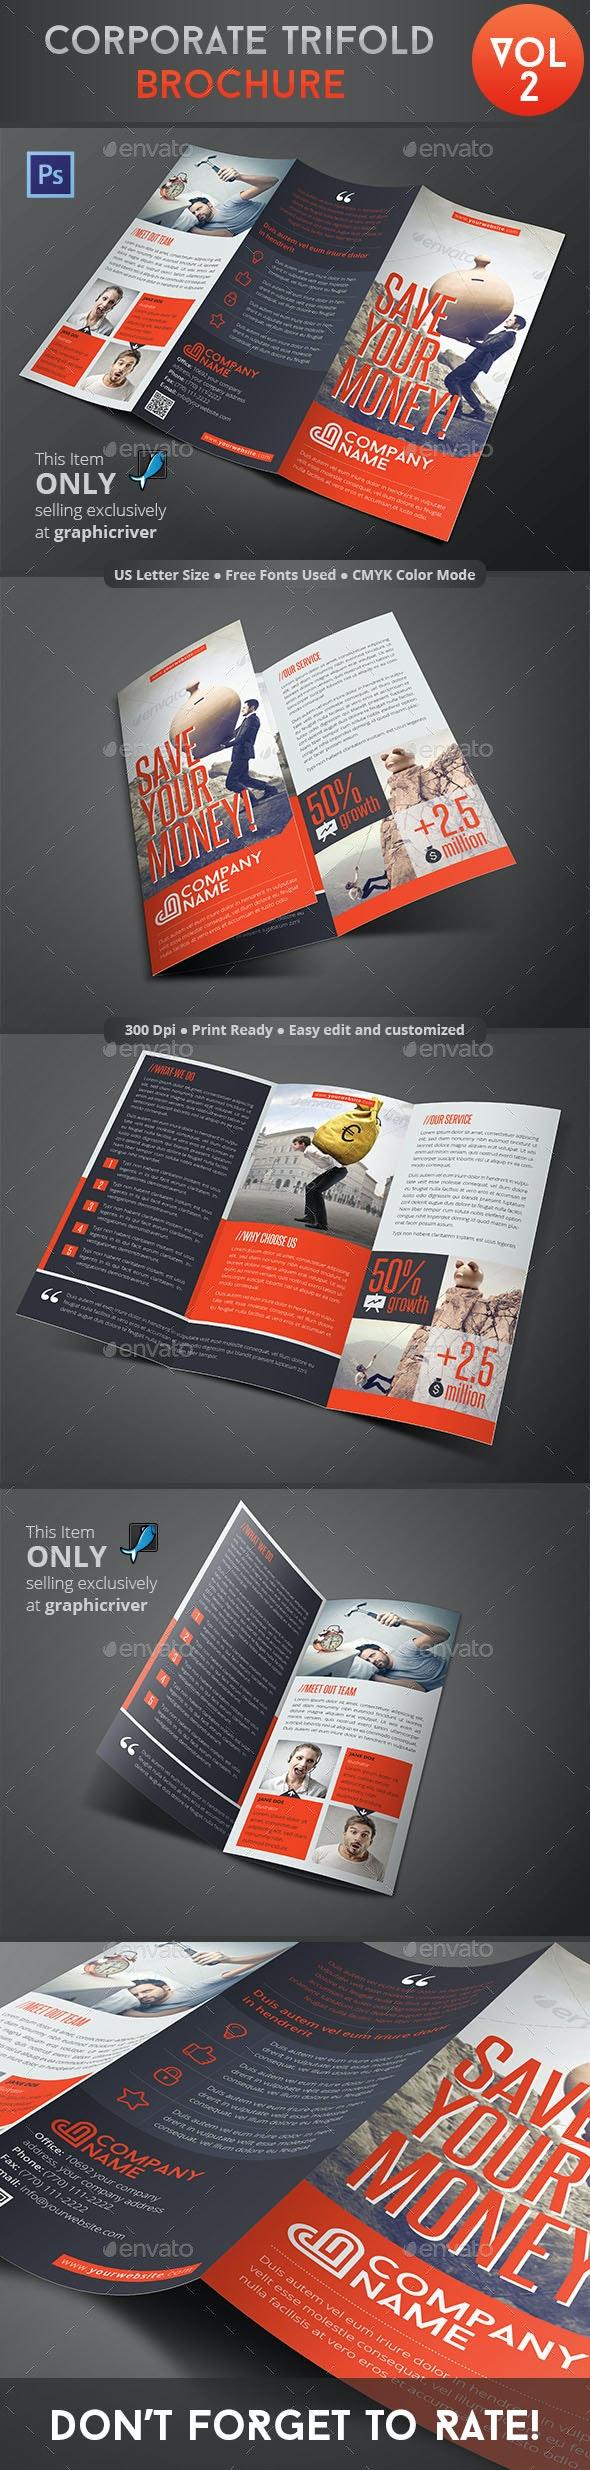 Corporate Trifold Brochure Vol 2 - Corporate Brochures